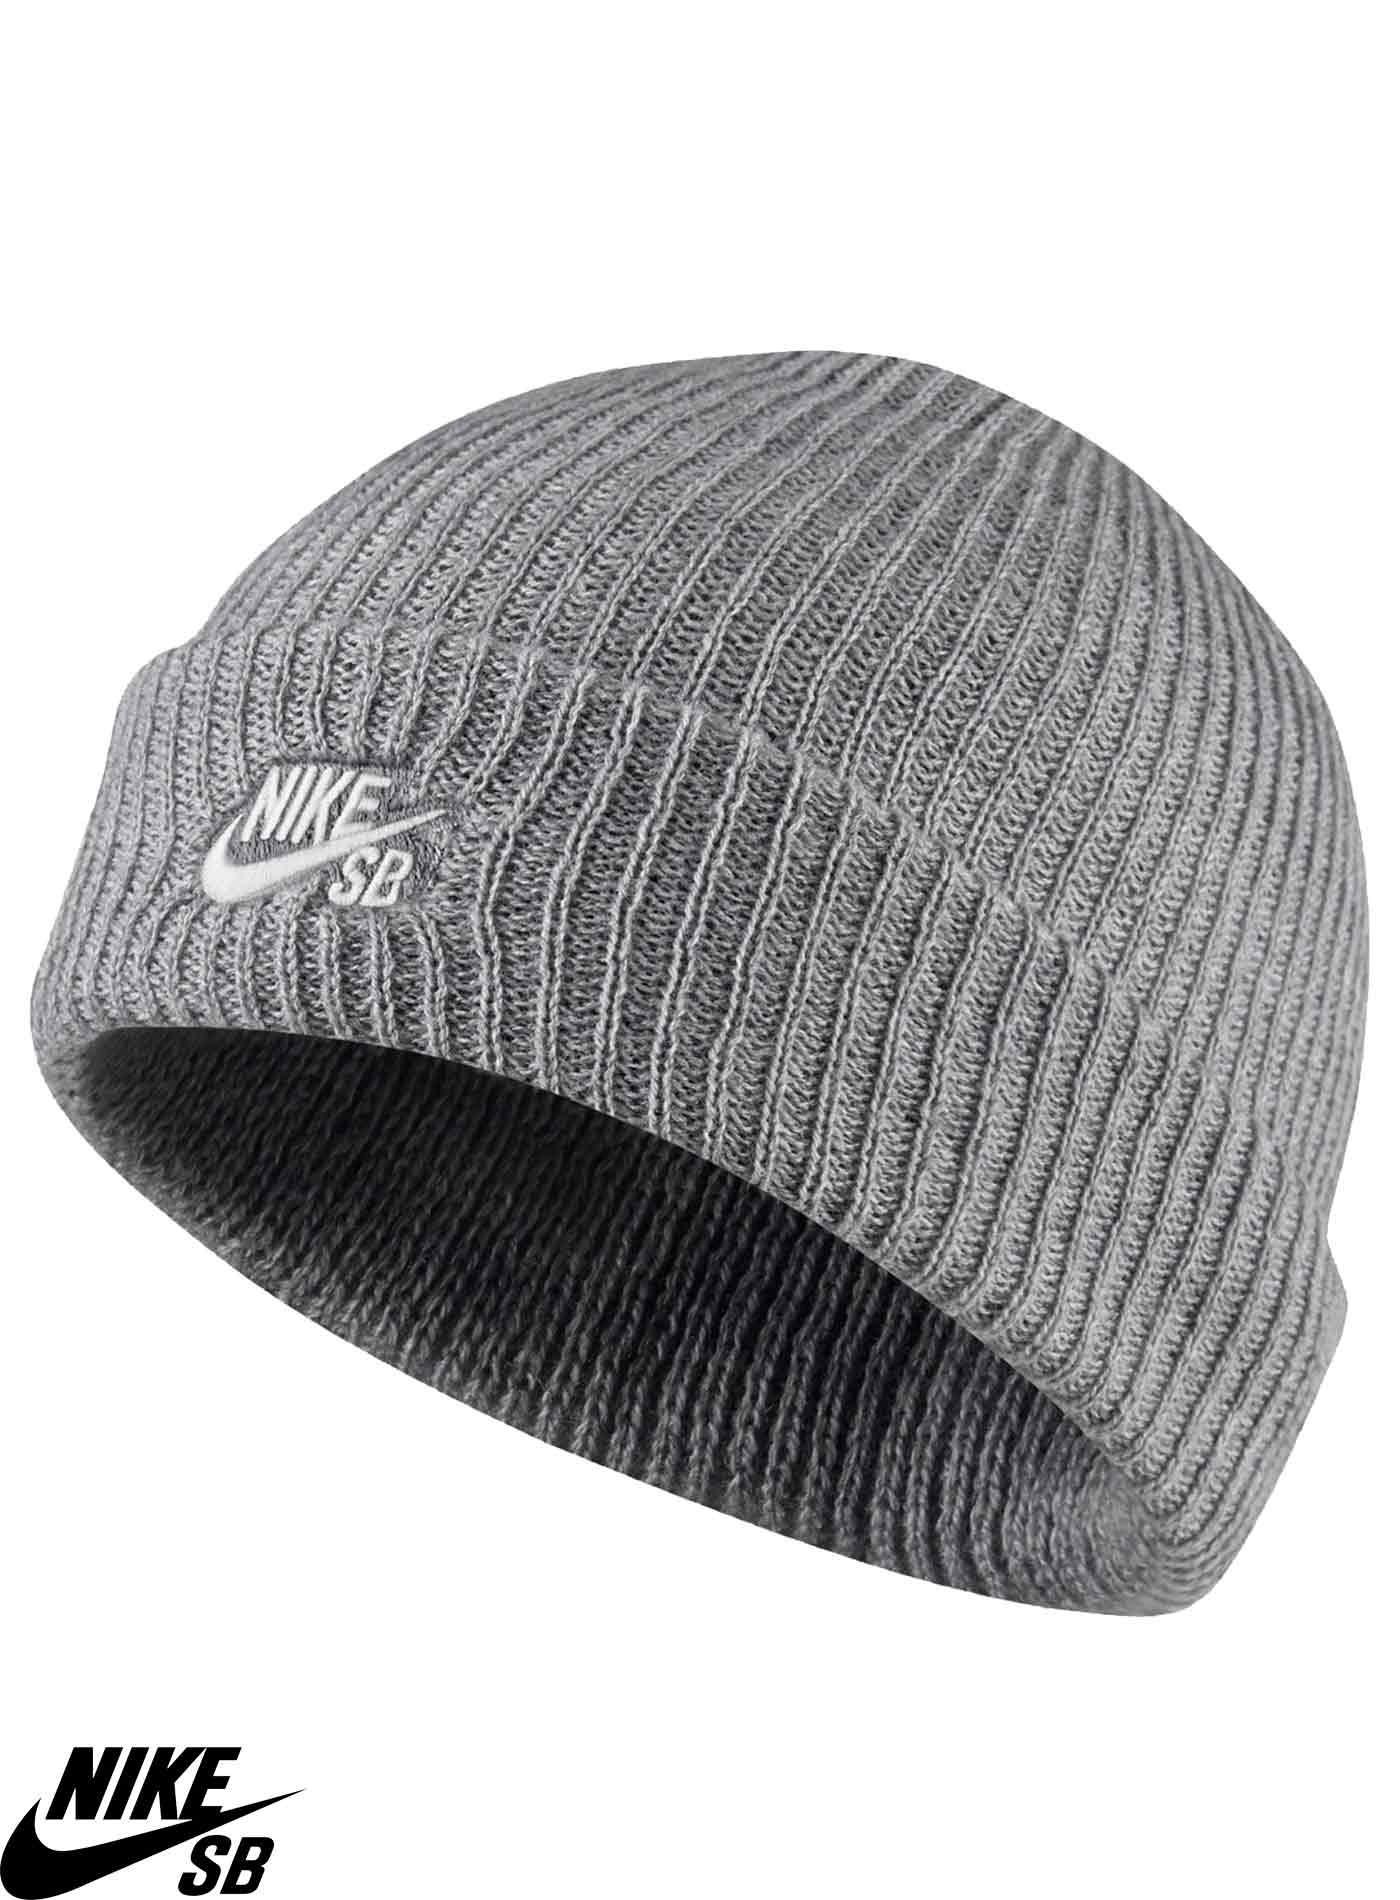 13d62282938e7 Bonnet Nike SB Fisherman Gris